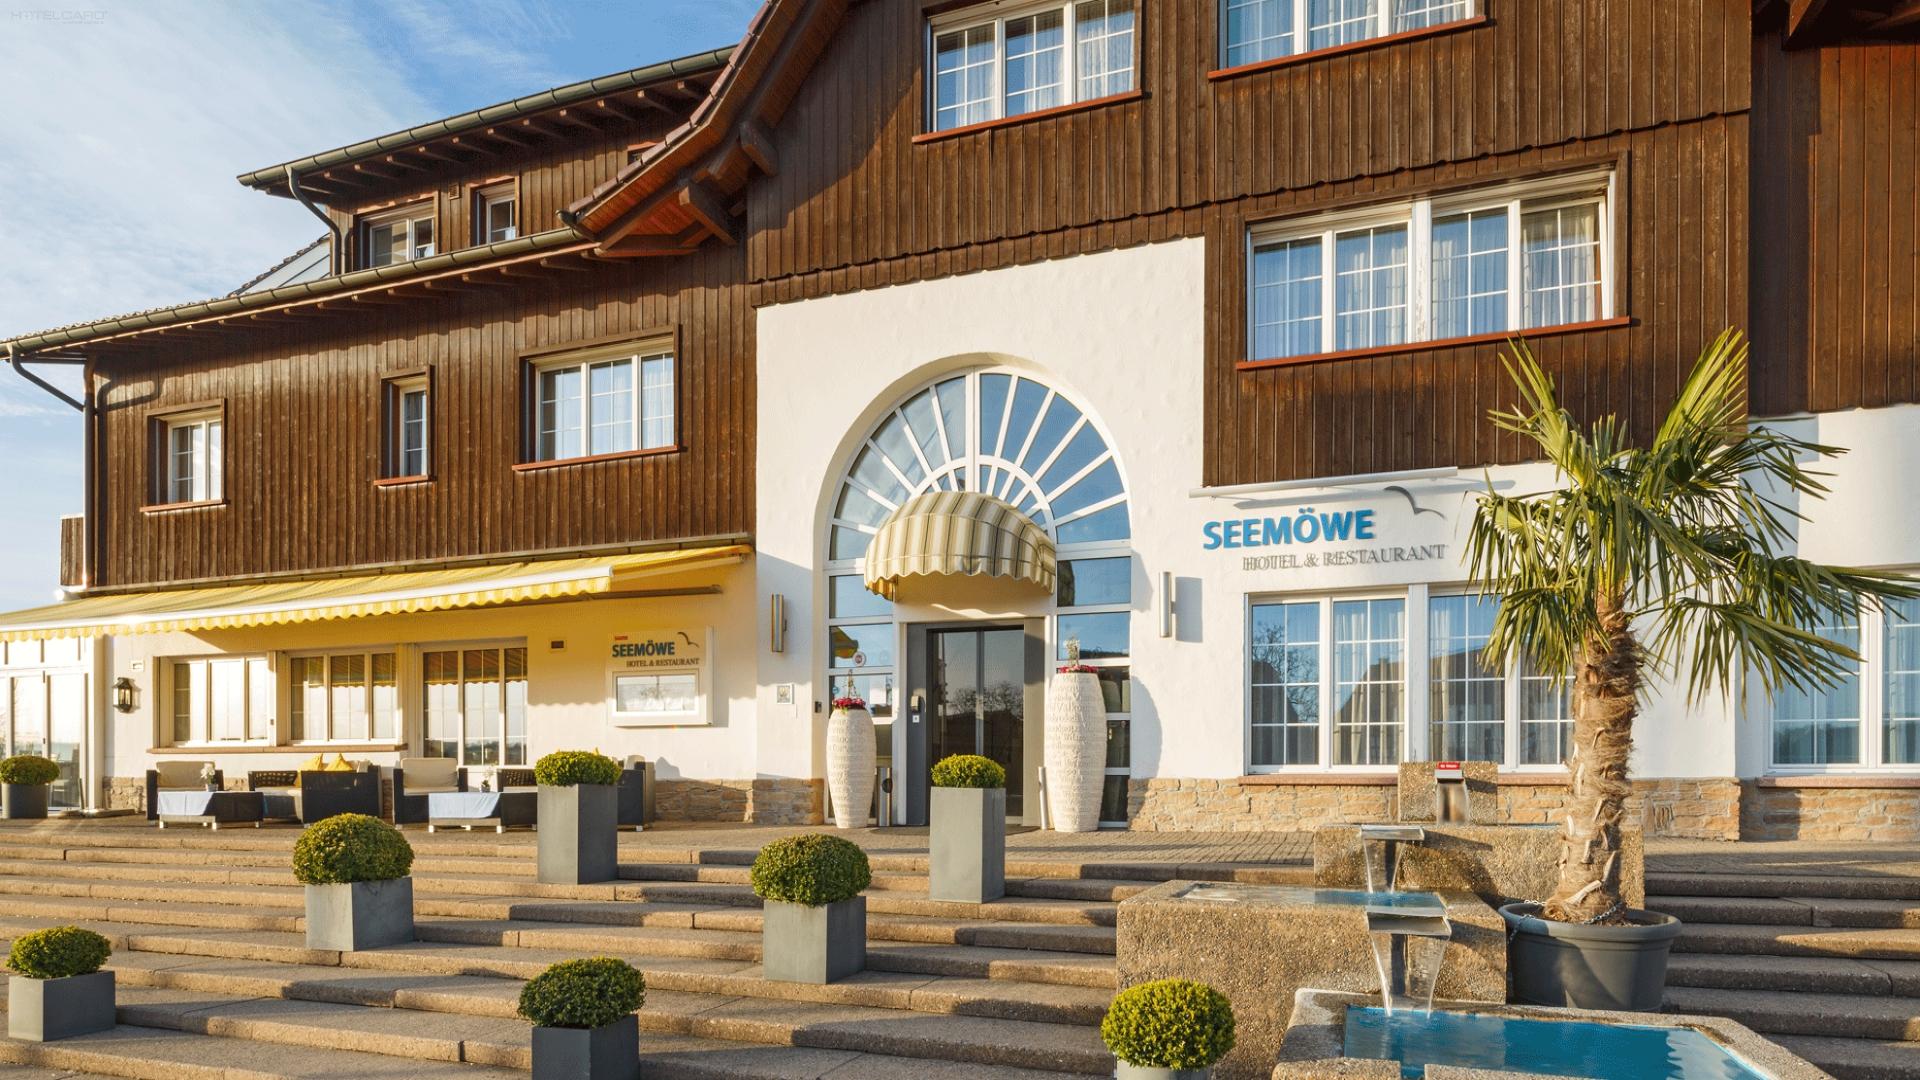 Hotel Restaurant Seemöwe 2